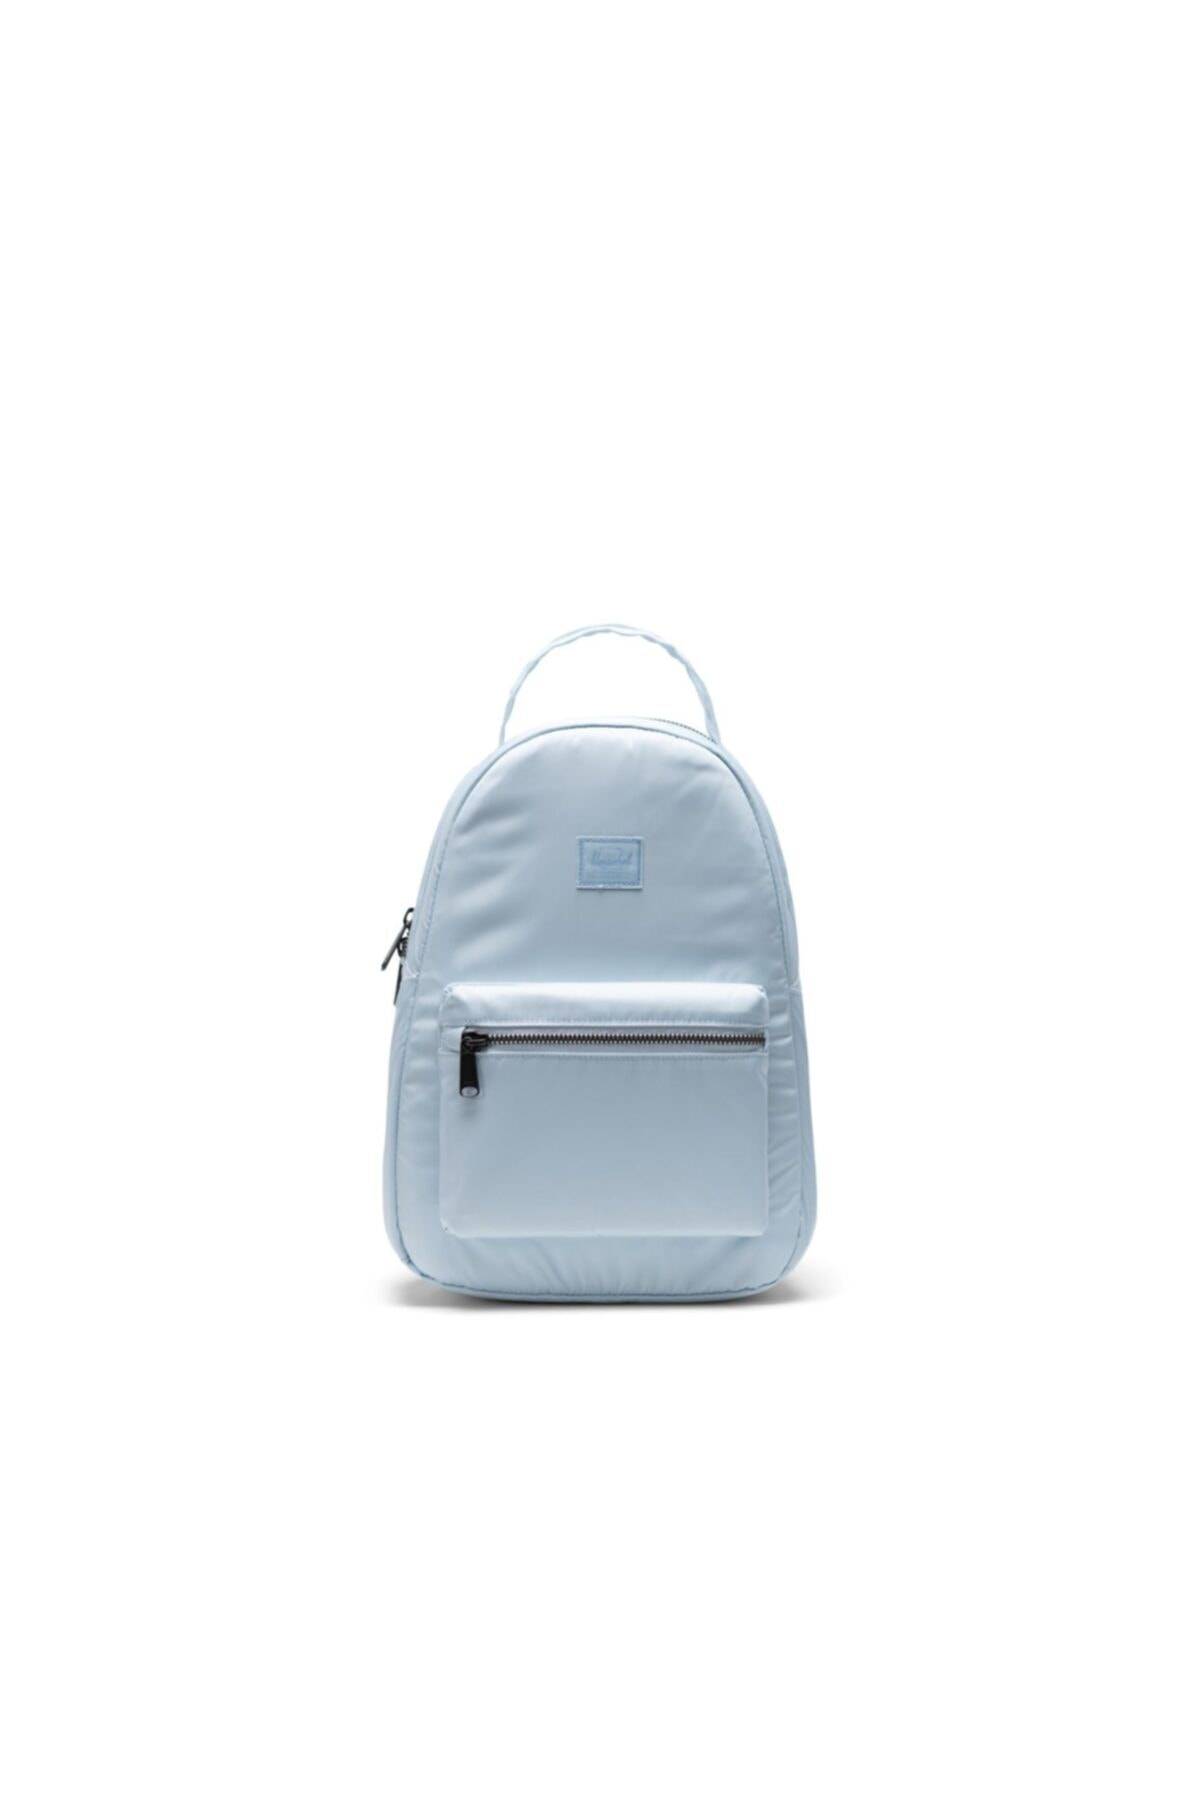 Herschel Supply Co. Nova Small Ballad Blue Pastel Sırt Çantası 1